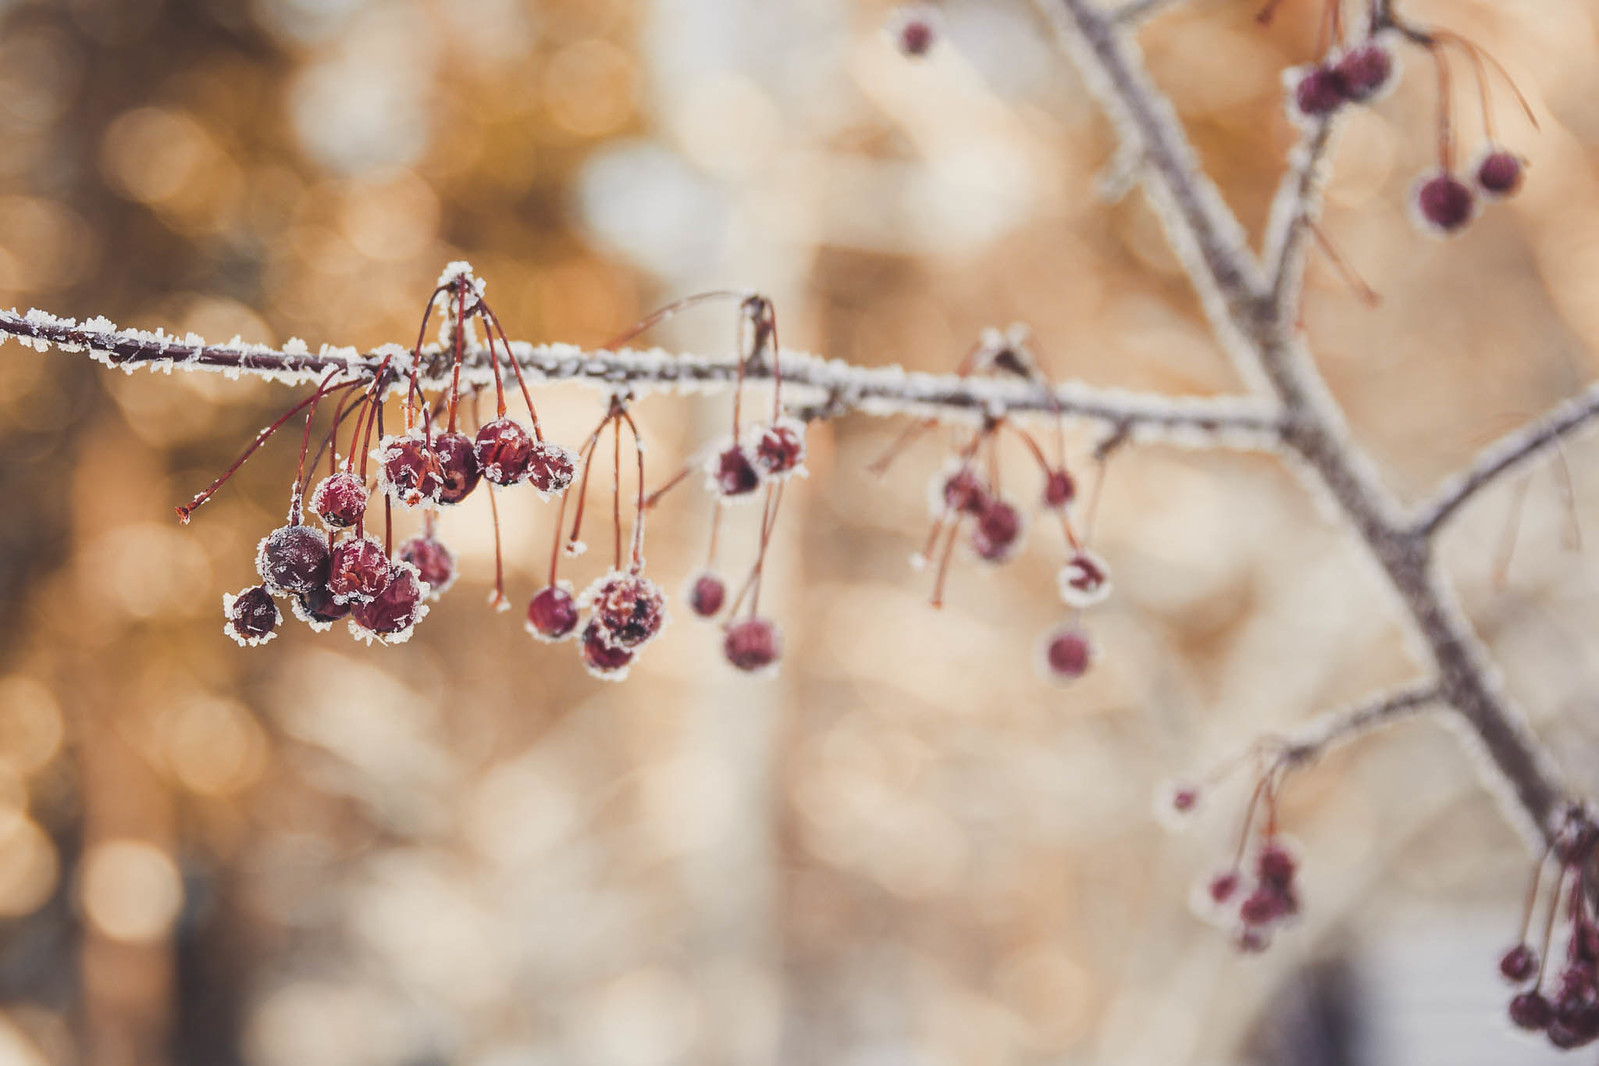 Digitrail / Aulanko talvi